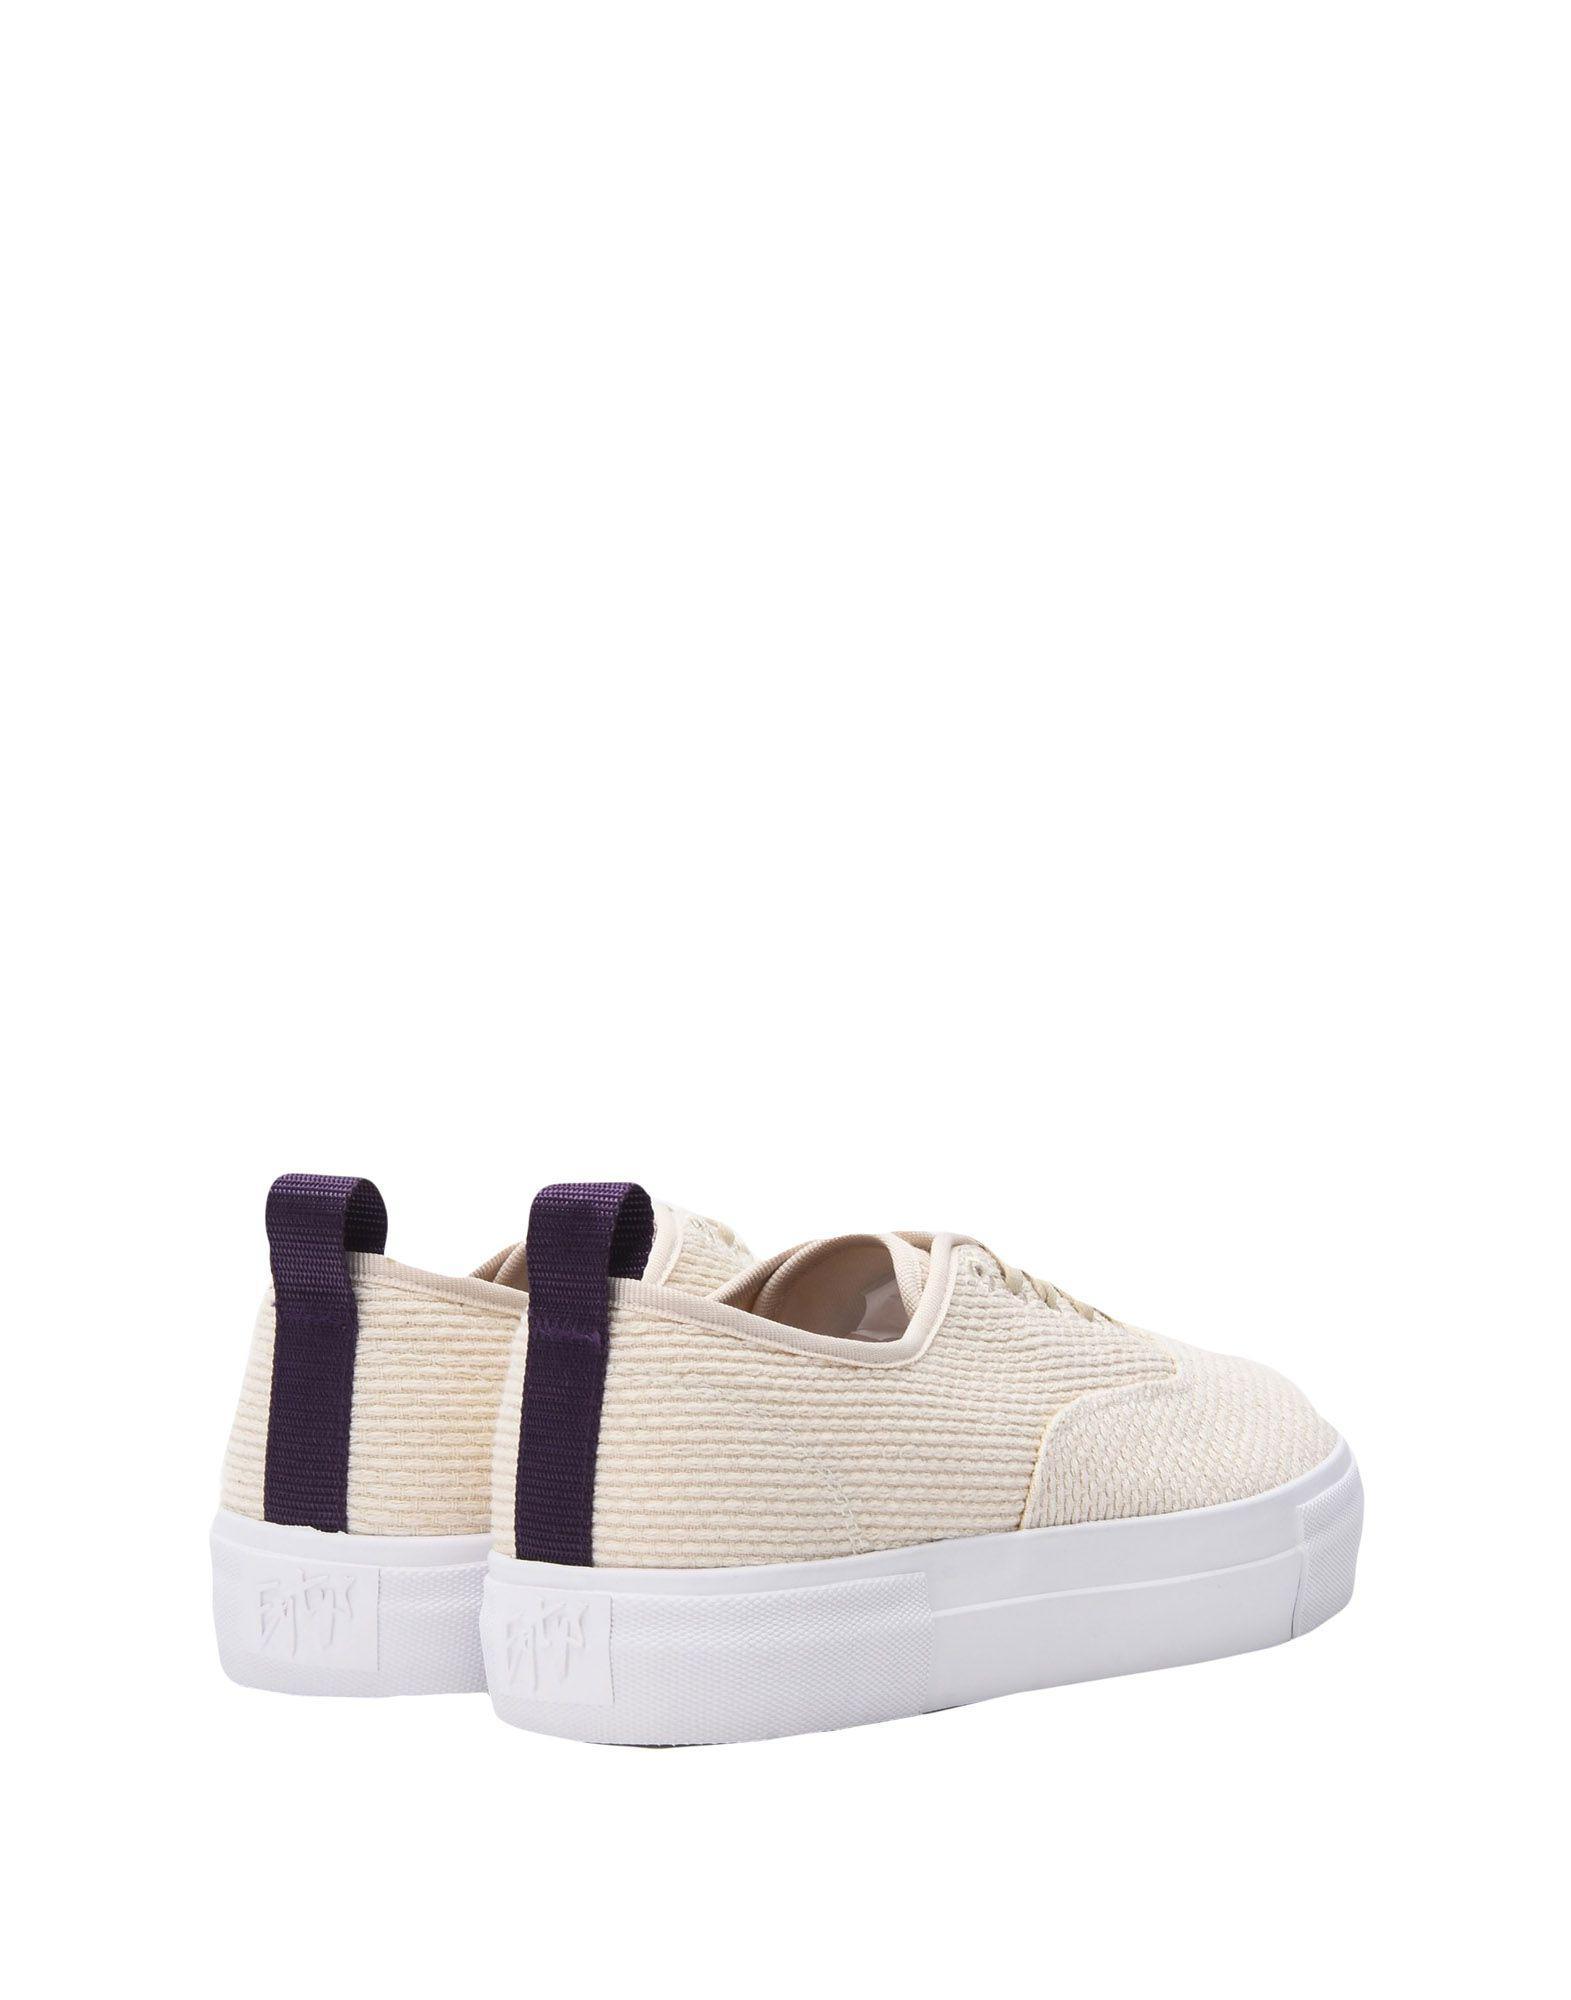 Eytys Rubber Low-tops & Sneakers in Beige (Natural)